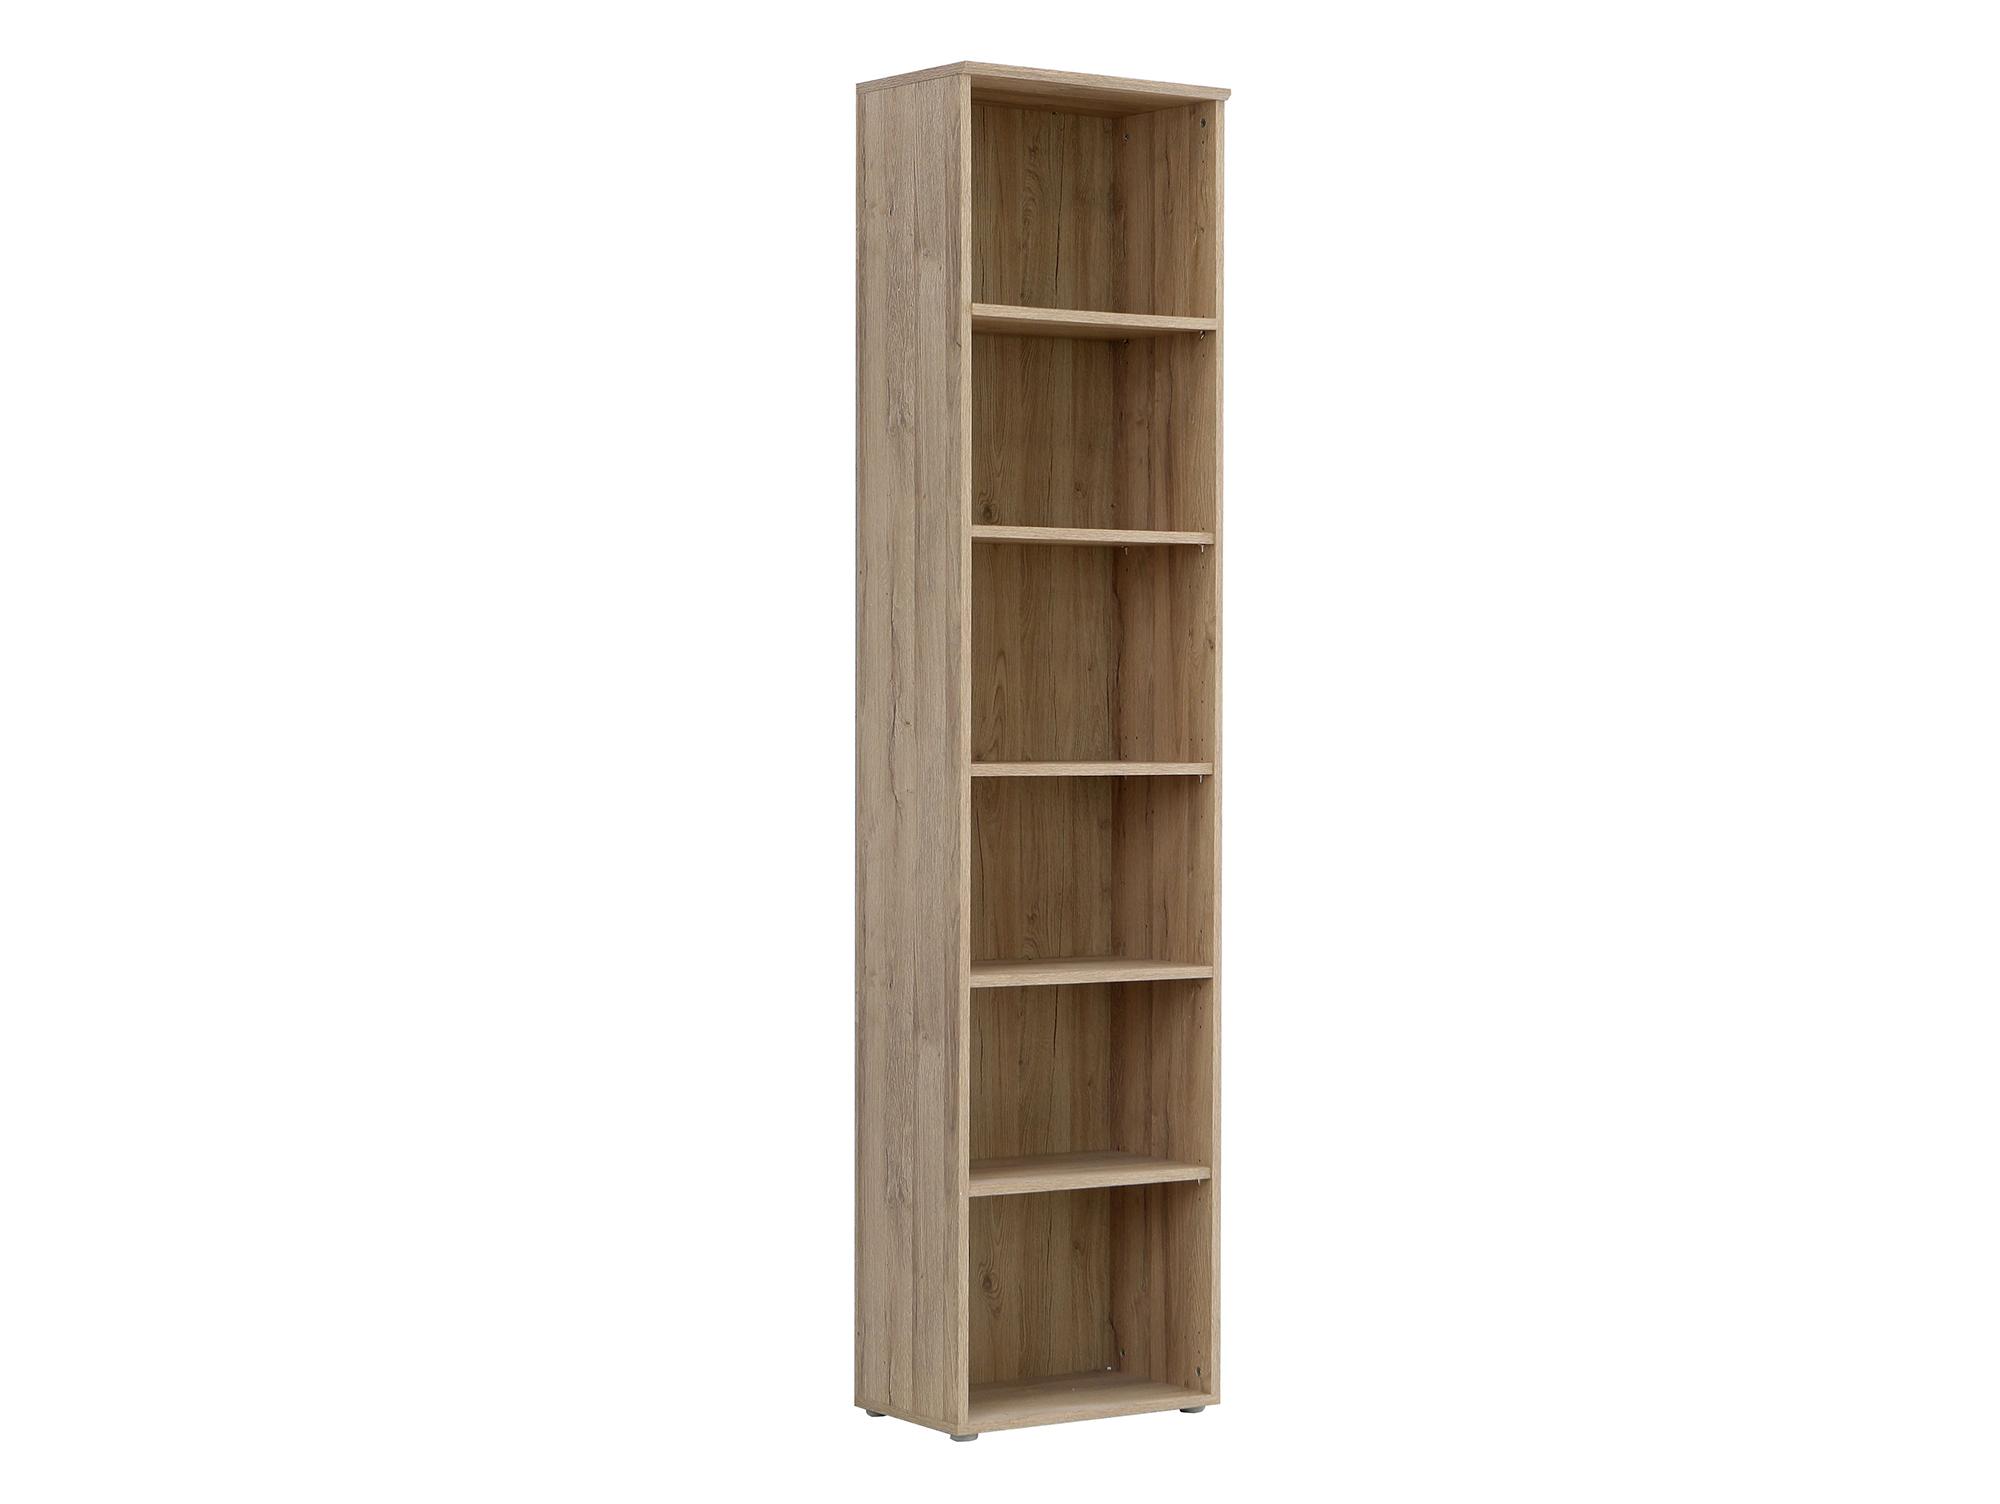 maraun regal offen eiche bianco 51 cm 220 cm. Black Bedroom Furniture Sets. Home Design Ideas